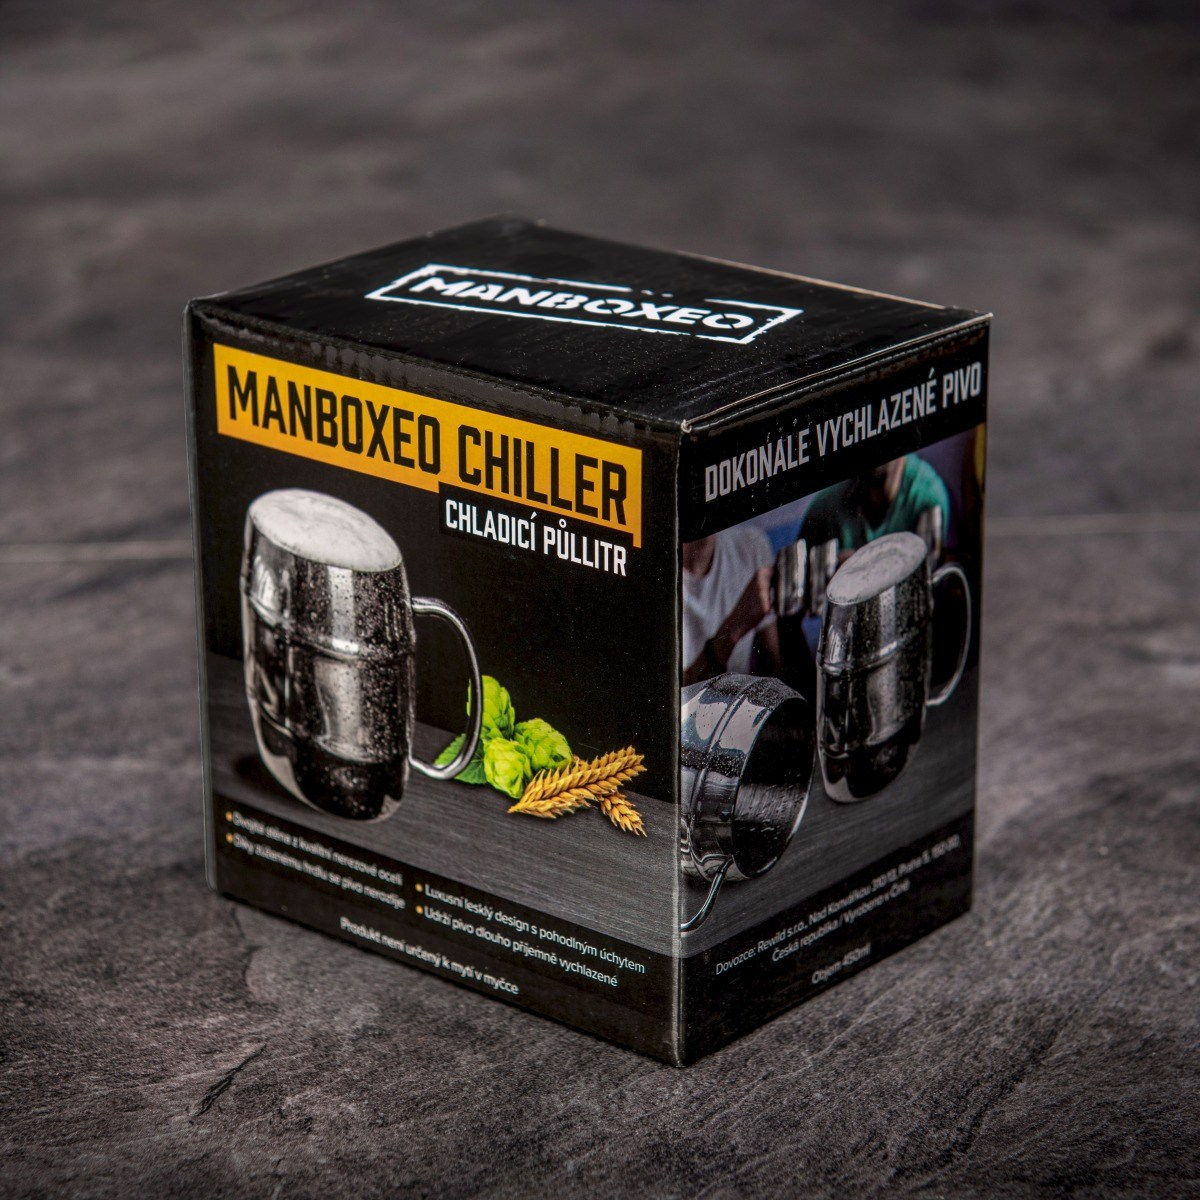 Chladicí půllitr Iron Chiller